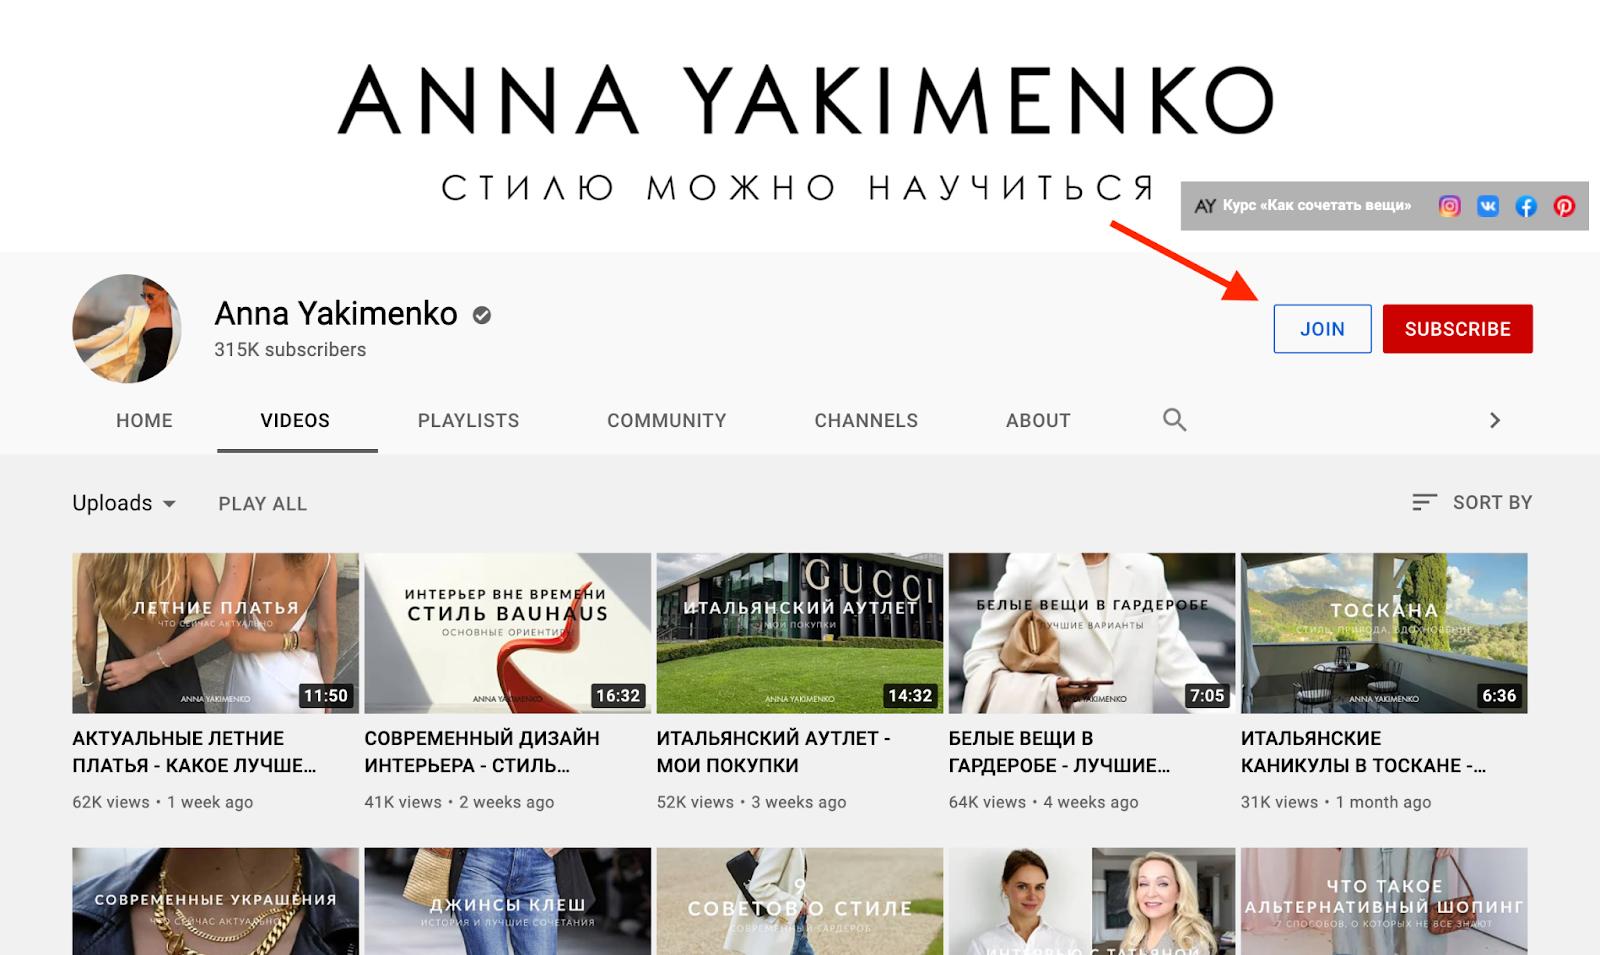 YouTube Monetization Example: Anna Yakimenko